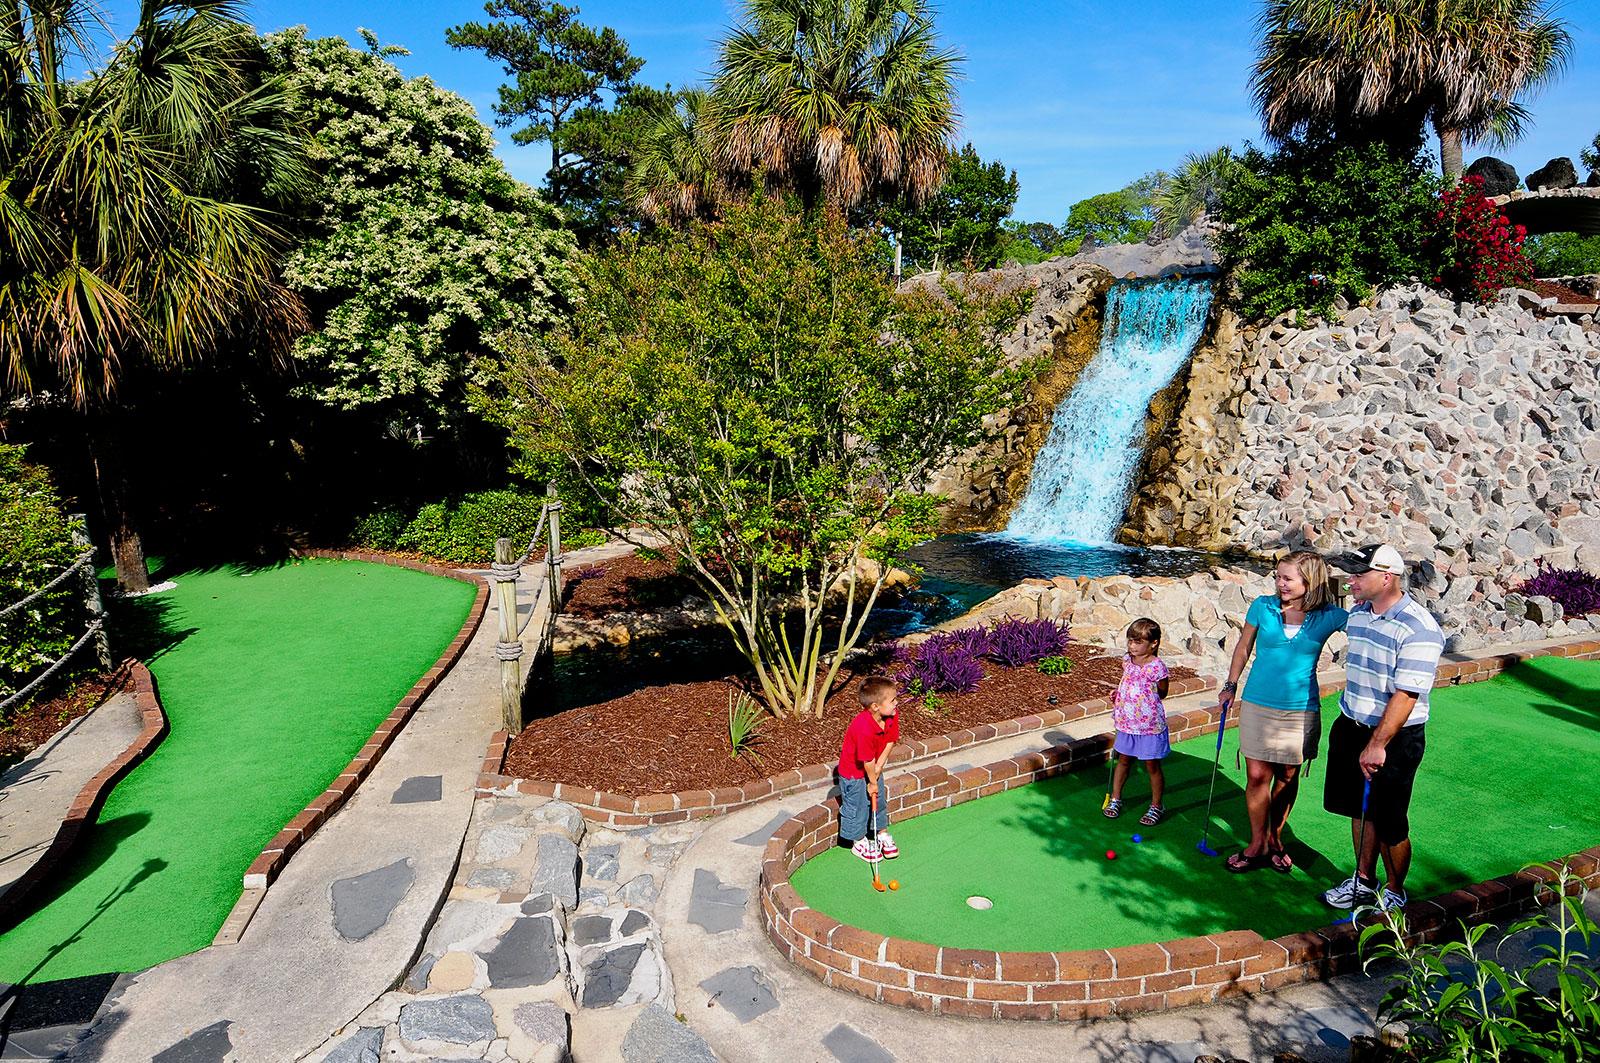 Jurassic Golf  Myrtle Beach Family Golf  Myrtle Beach SC